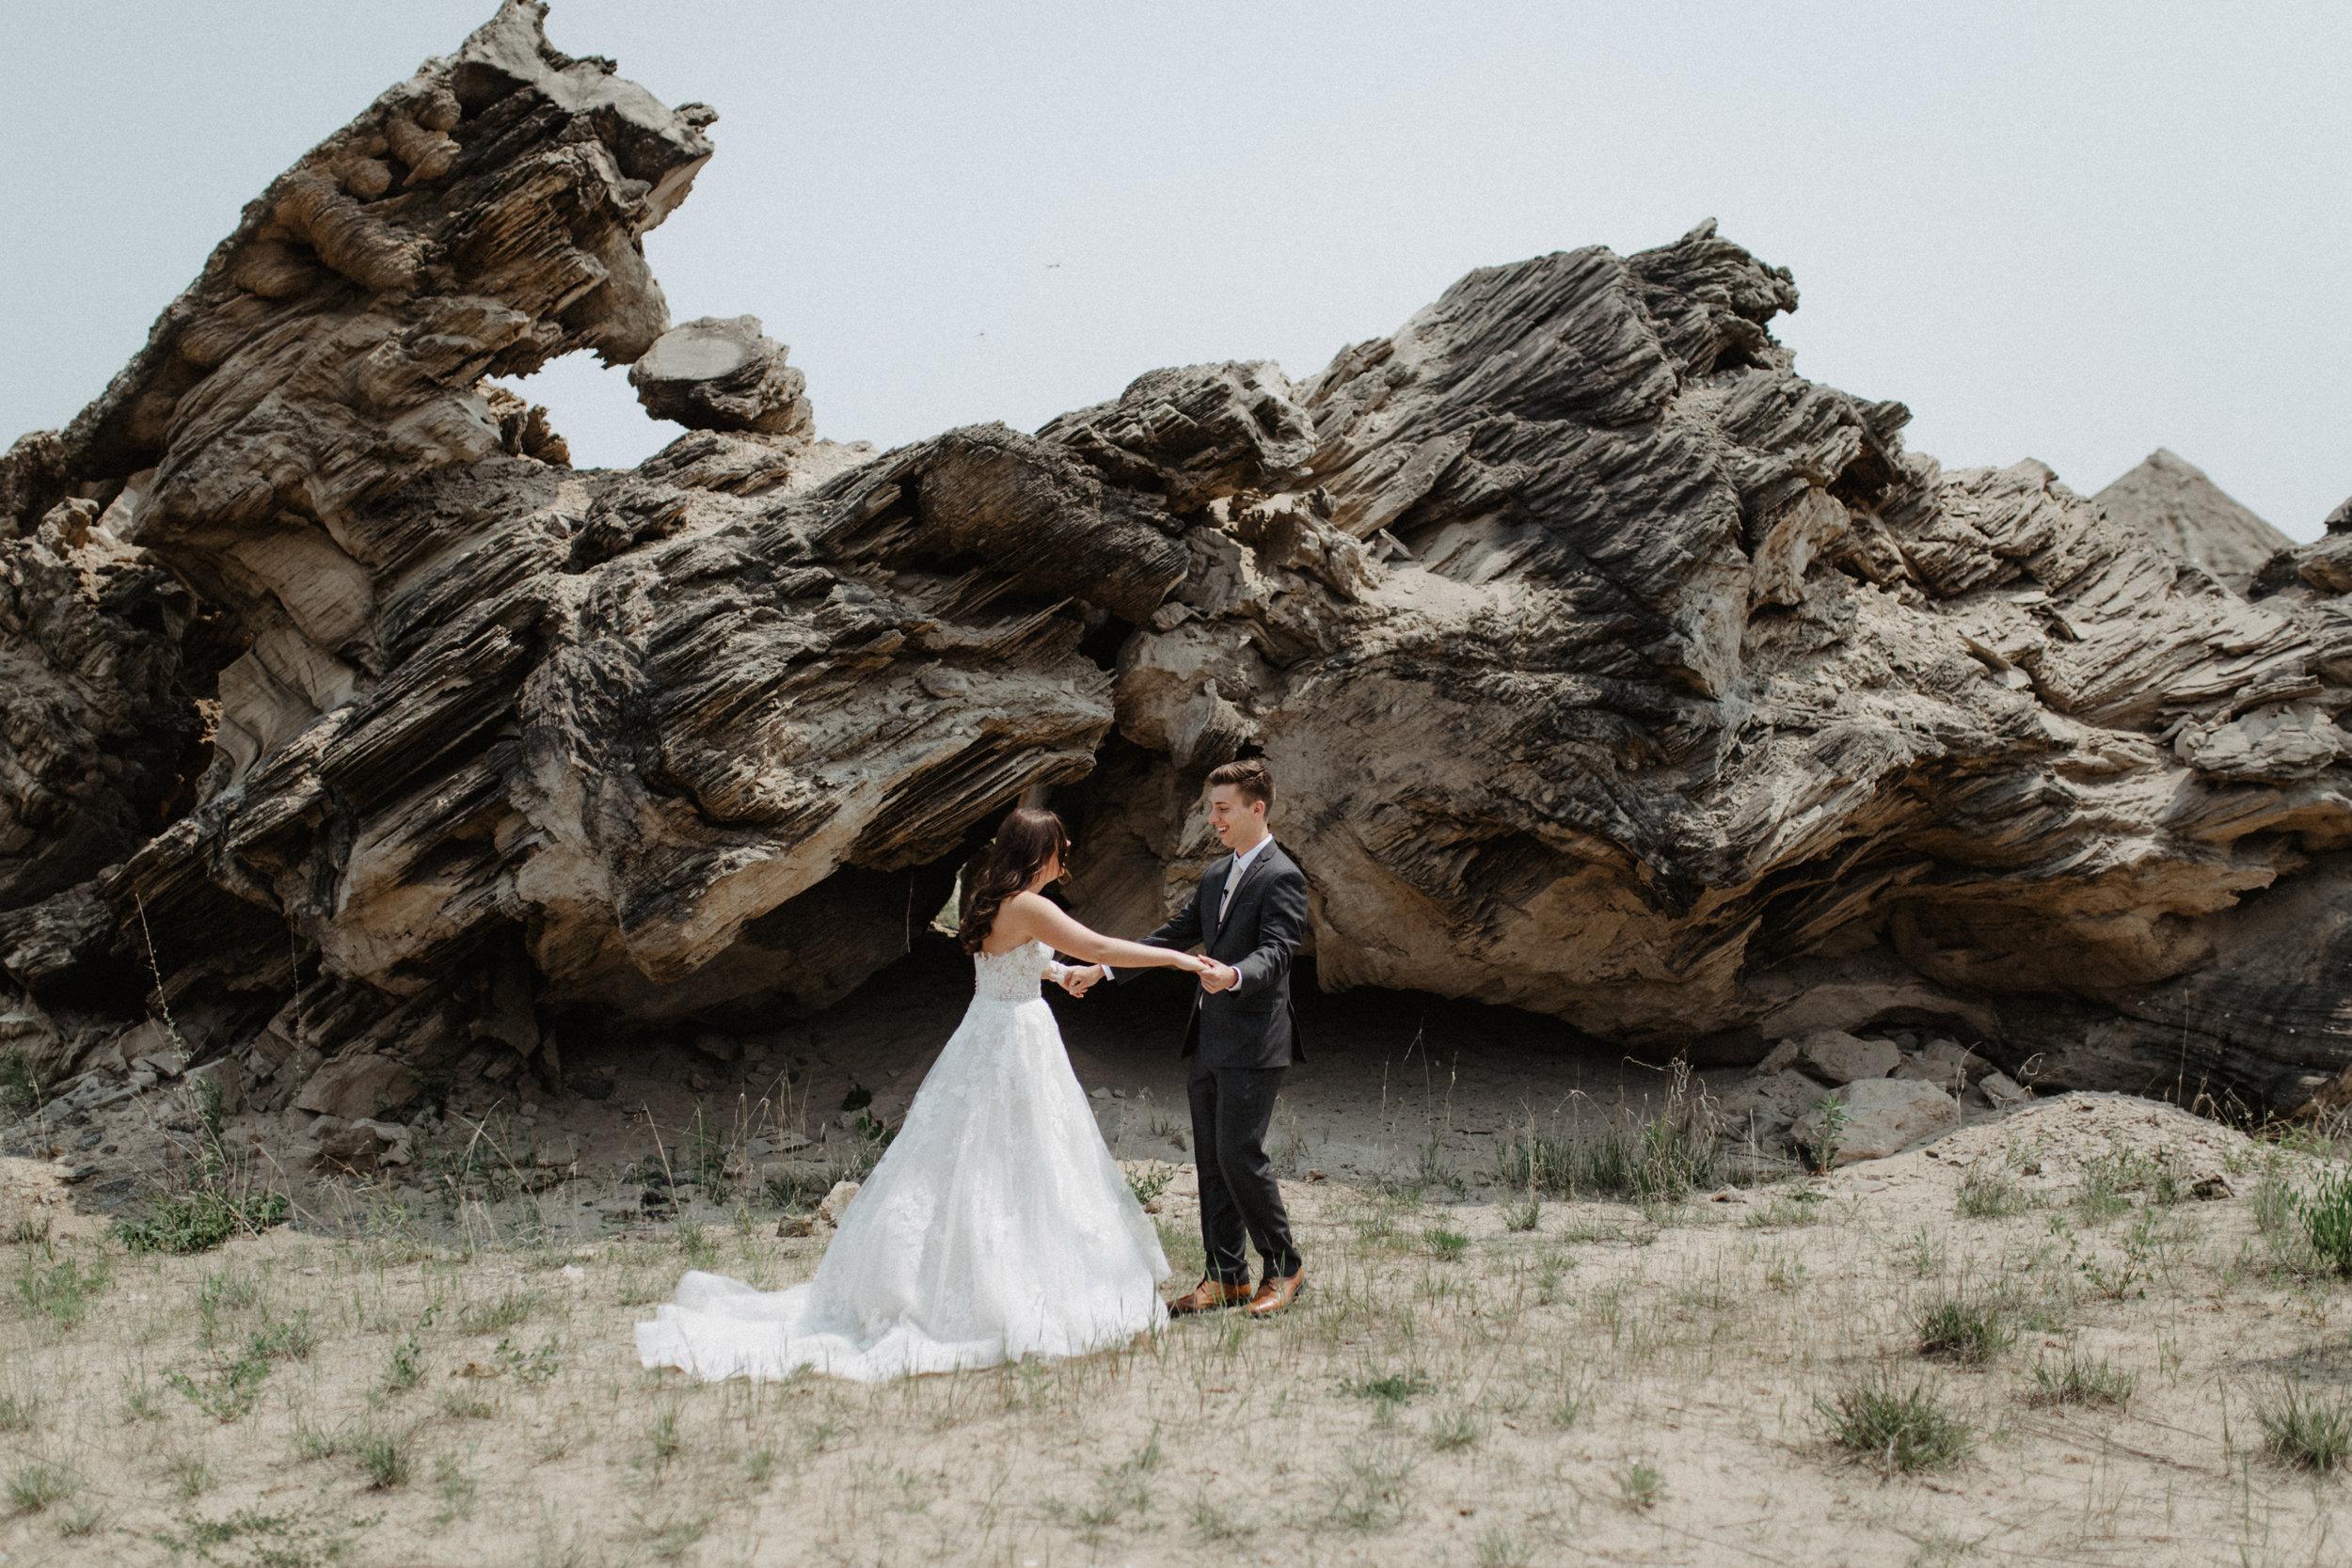 GRAYCENTOMHAMILTON-GRAND-RAPIDS-WEDDING-PHOTOGRAPHY-17.jpg